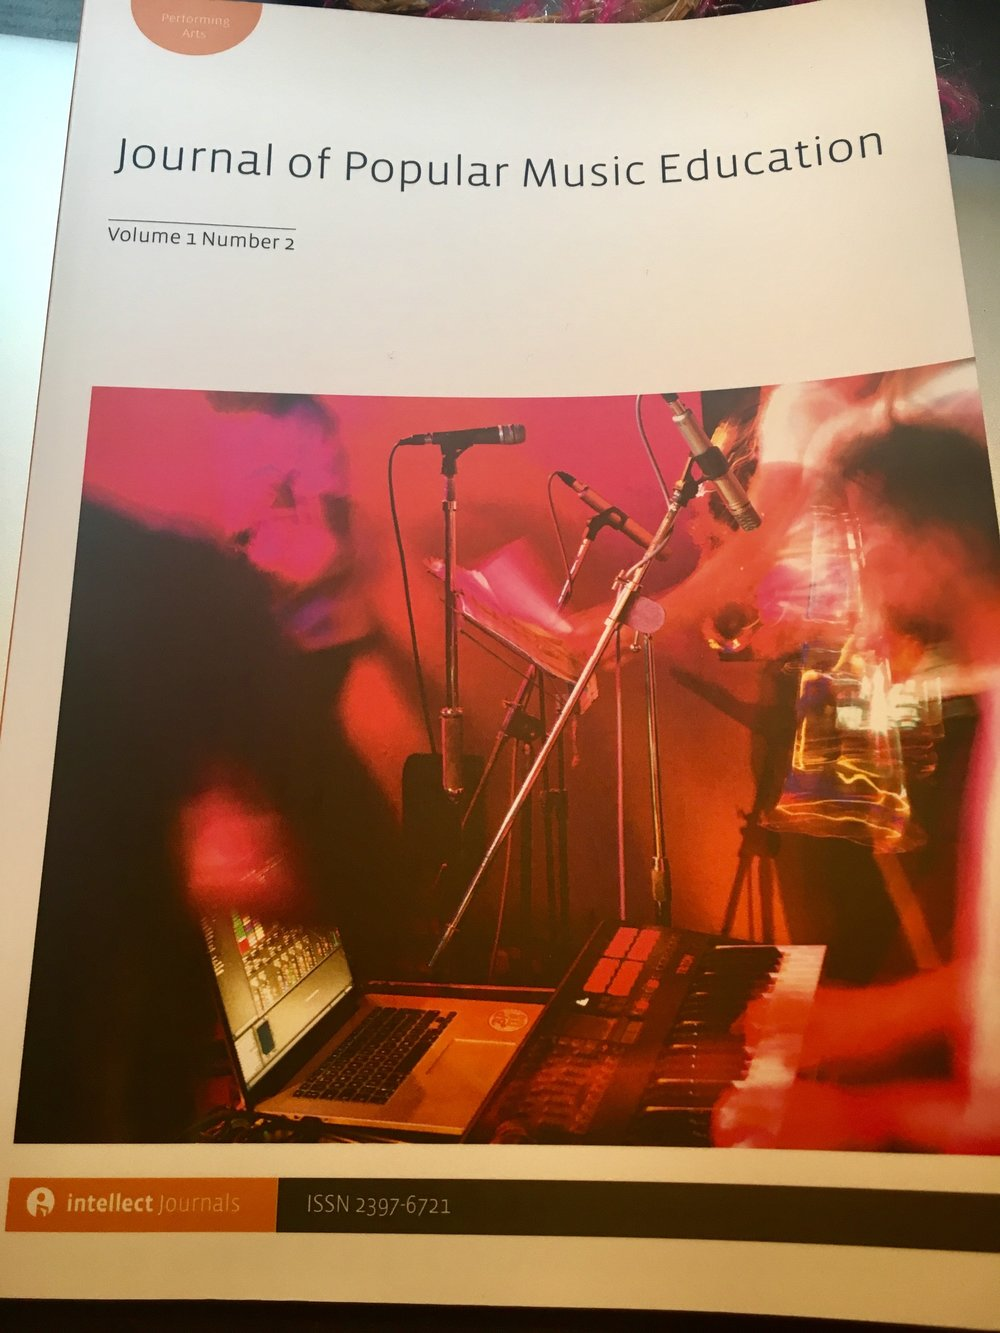 Journal of Popular Music Education